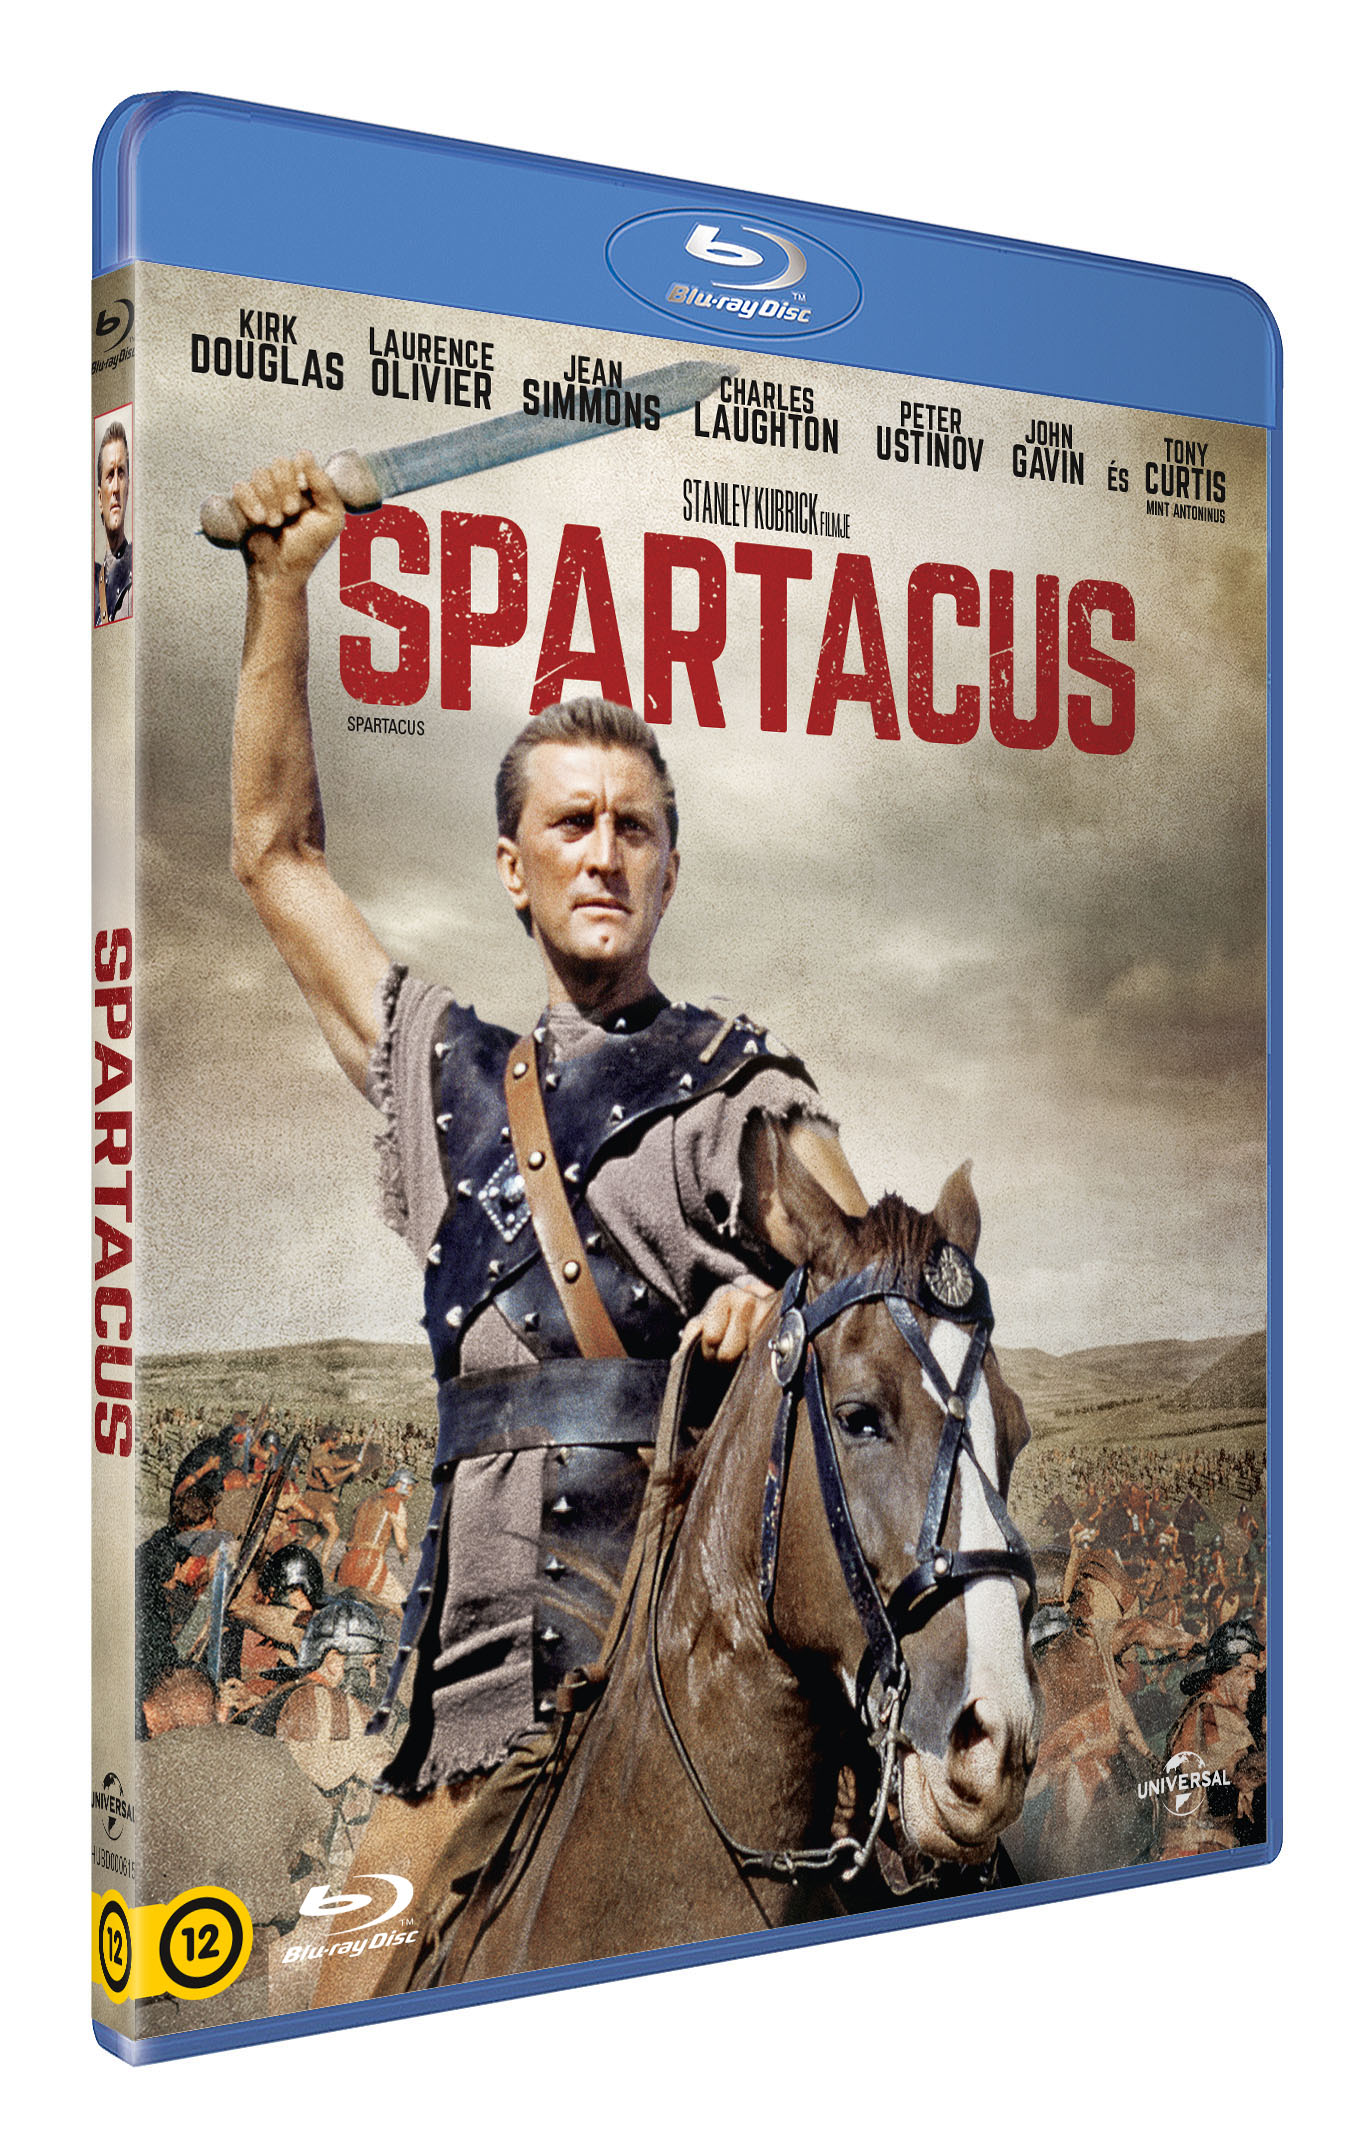 spartacus_hubd000615_3d.jpg